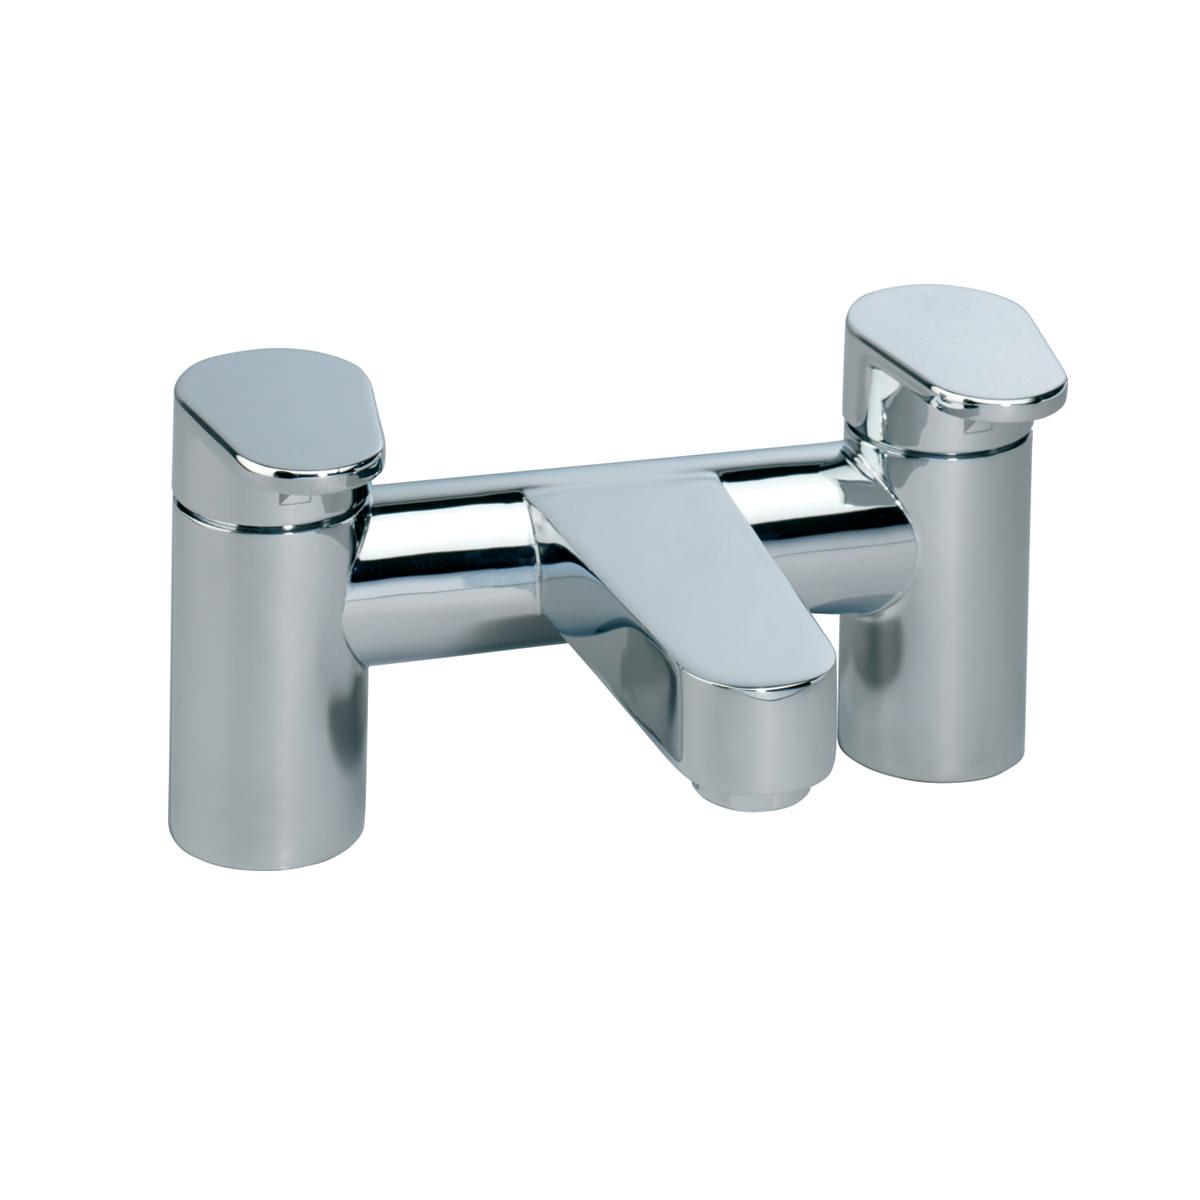 Roper Rhodes Stream Deck Mounted Bath Filler Tap Chrome